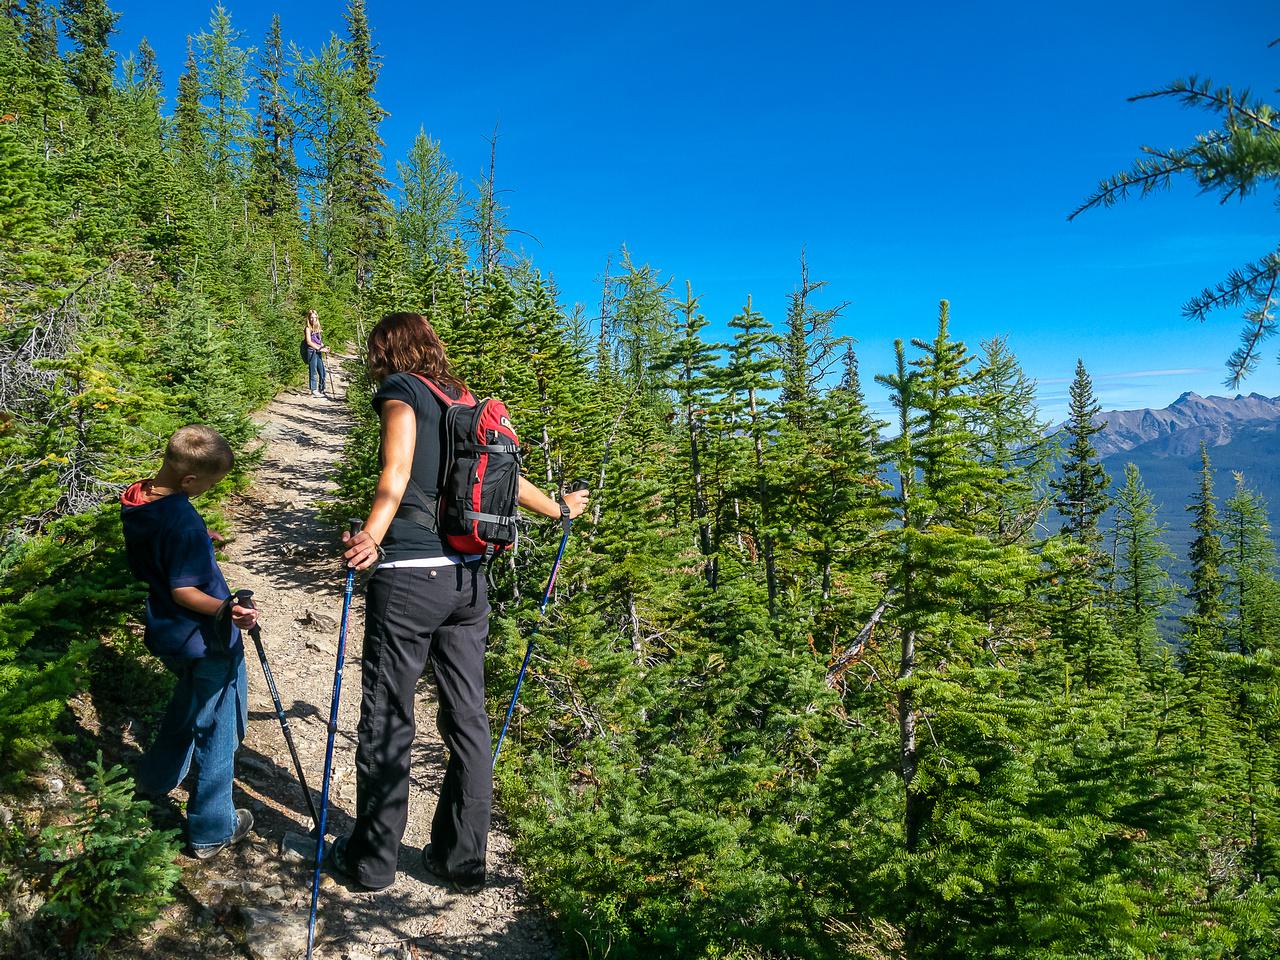 Ascending to Saddleback Pass on a good trail.